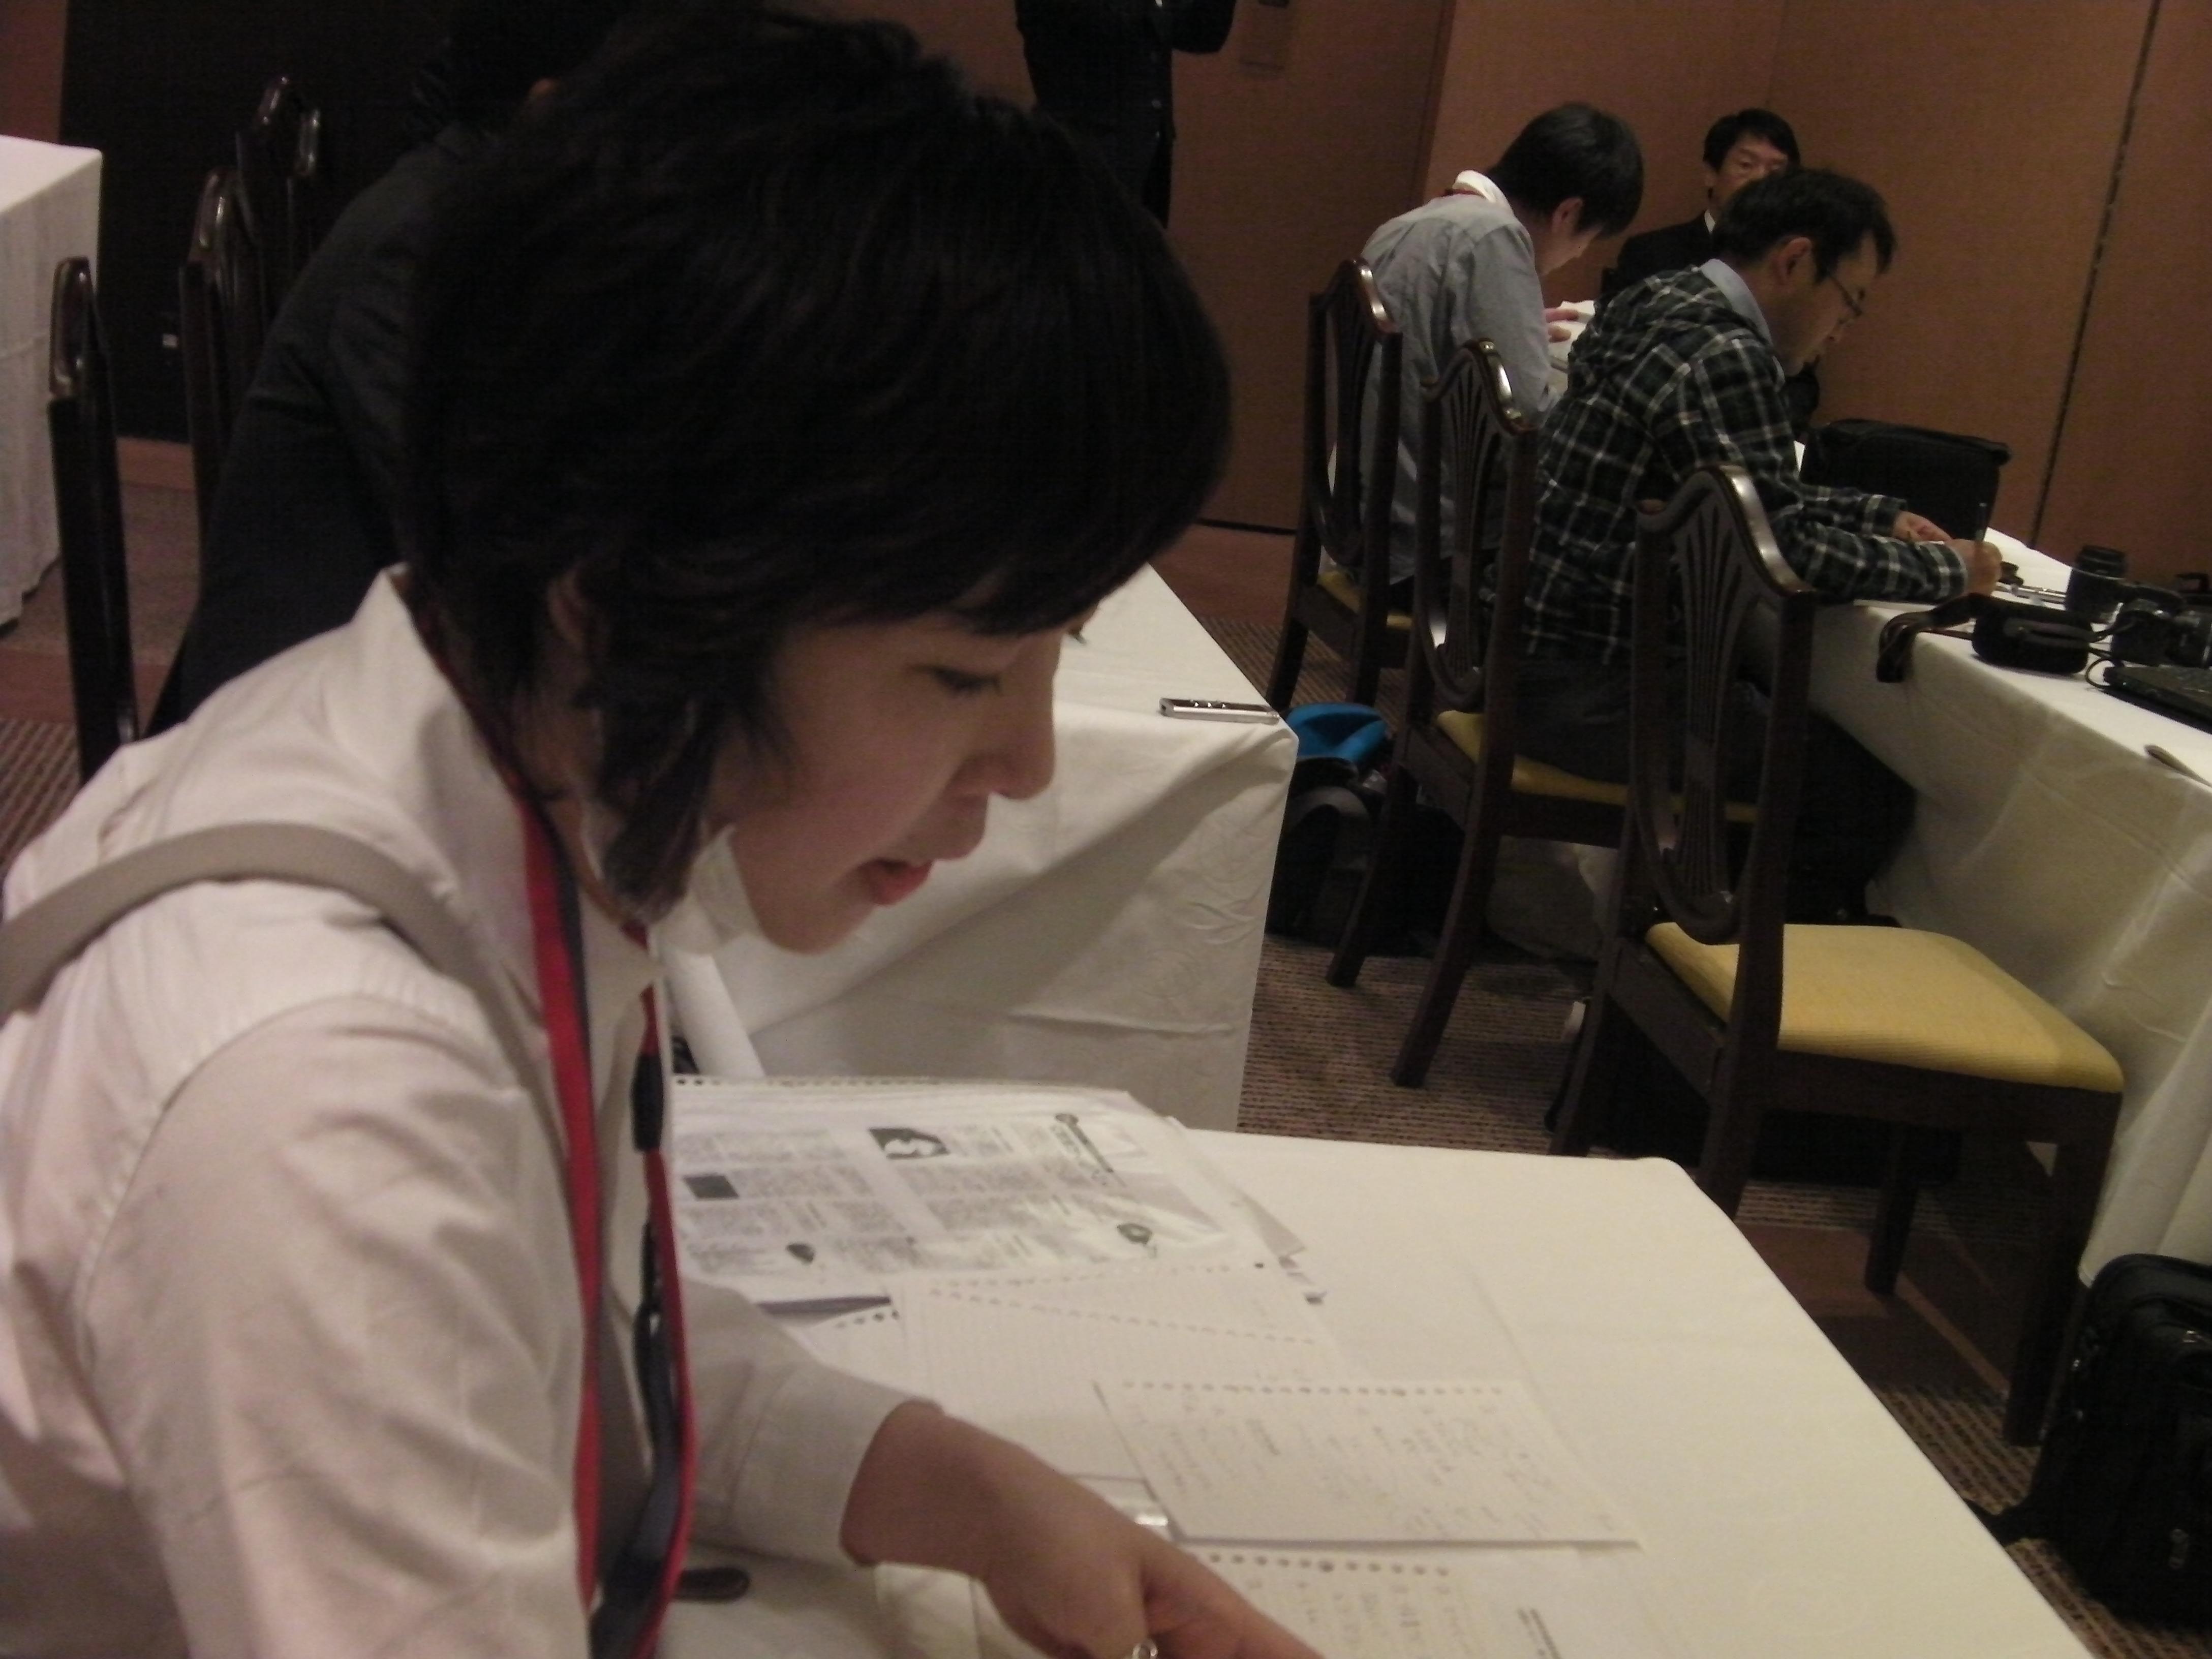 http://daily.magazine9.jp/m9/oshidori/SANY0261.JPG